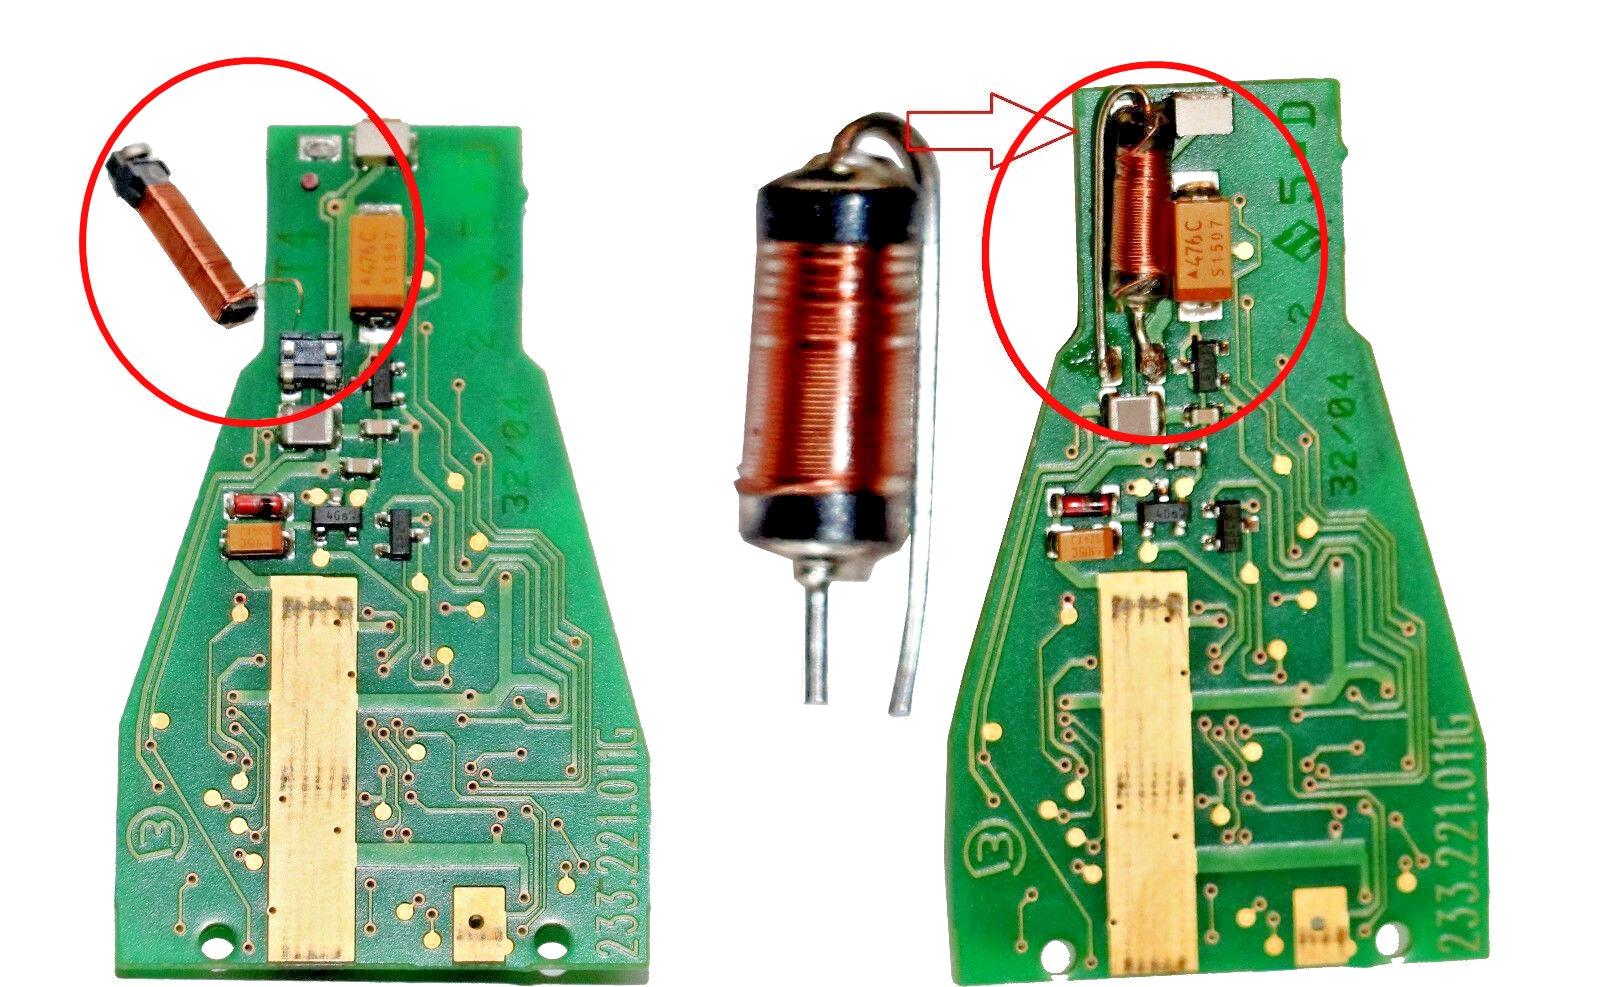 antenna-Transponder-Key-Fob-Repair-Mercedes.jpg (772 KB)